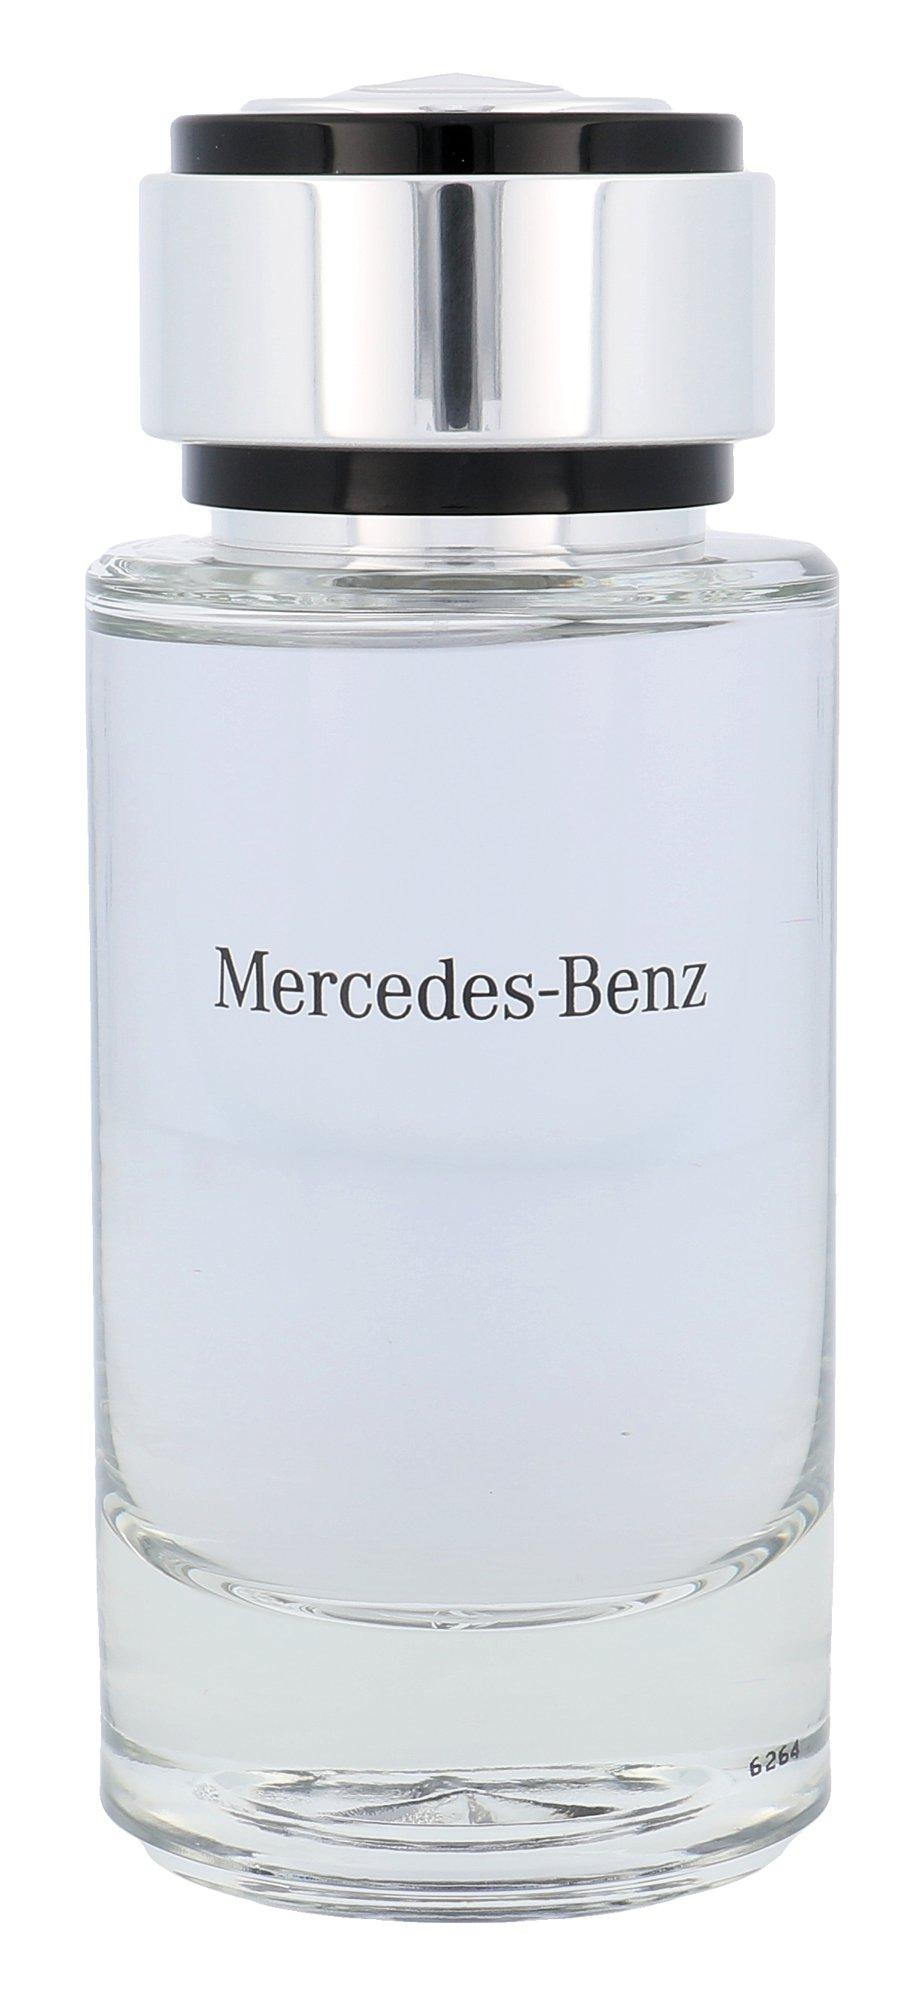 Mercedes-Benz Mercedes-Benz For Men, edt 120ml